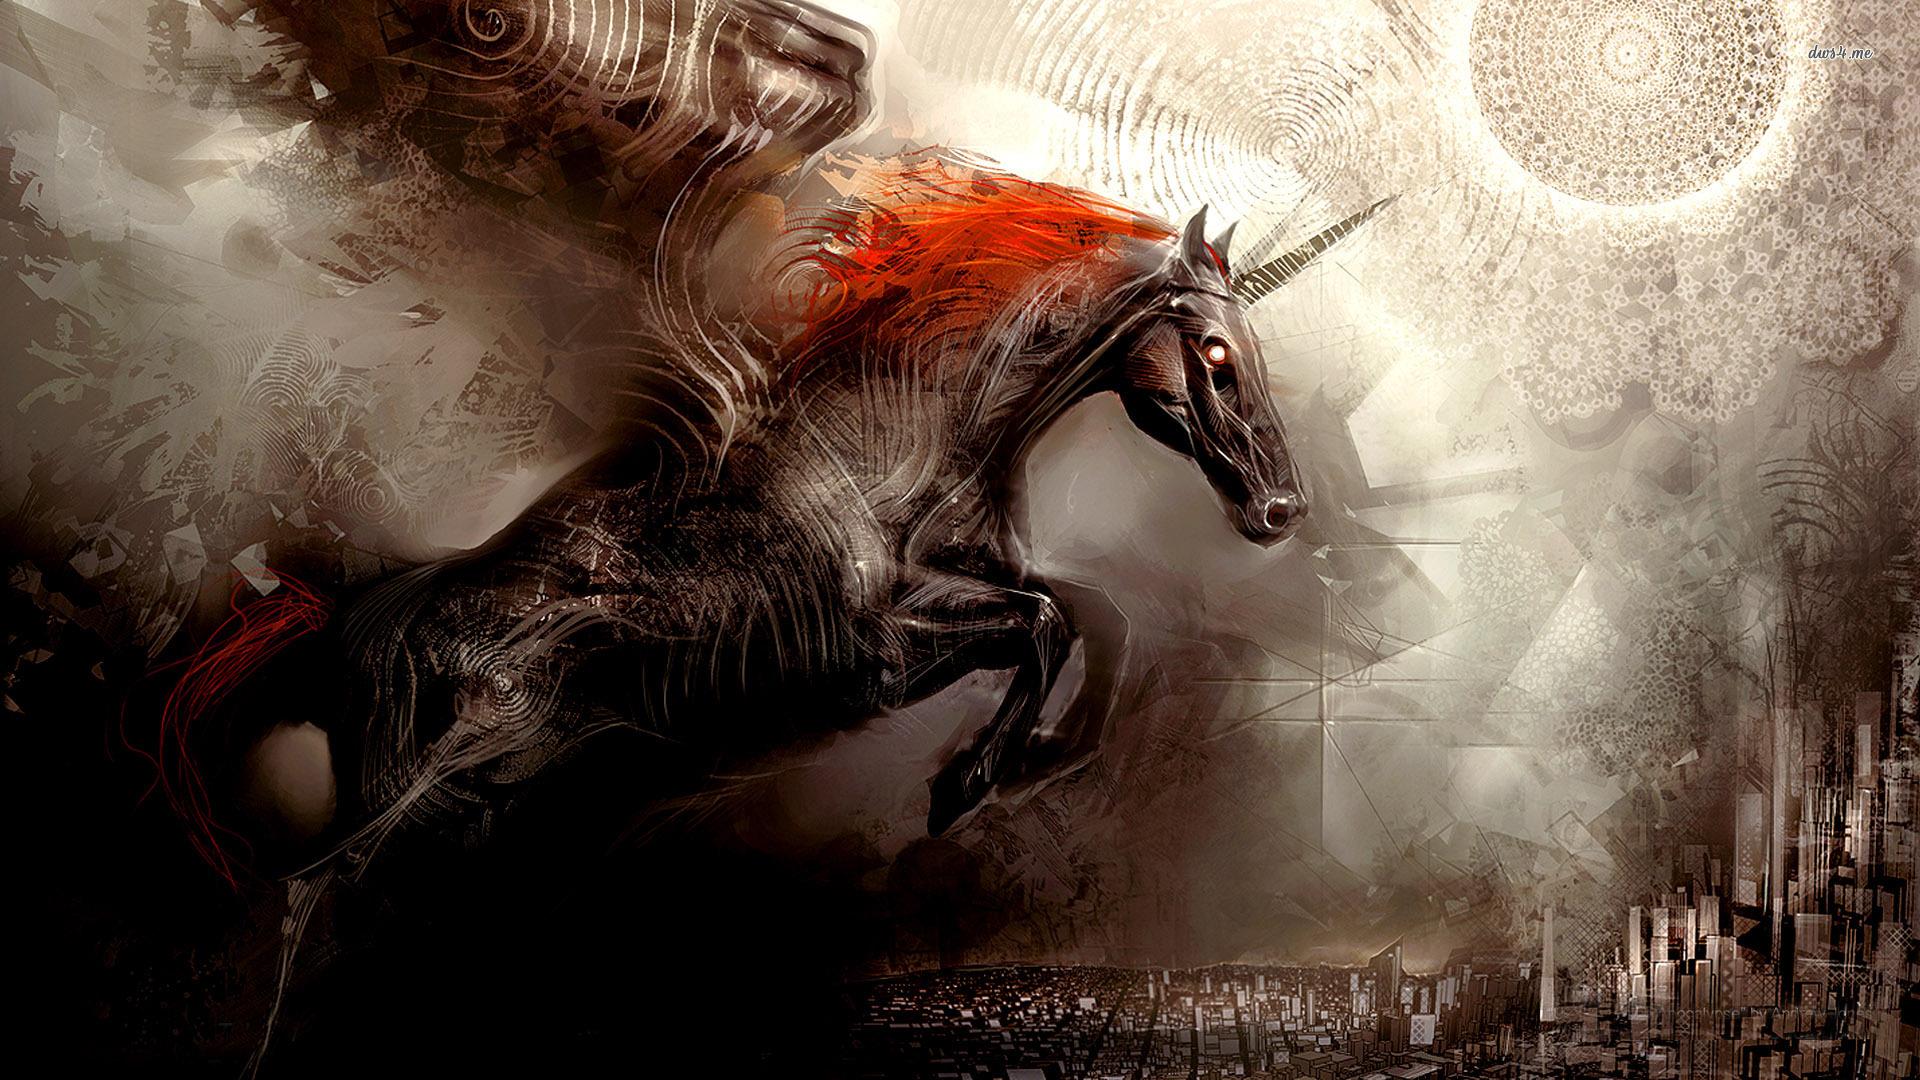 Unicorn wallpaper   695216 1920x1080